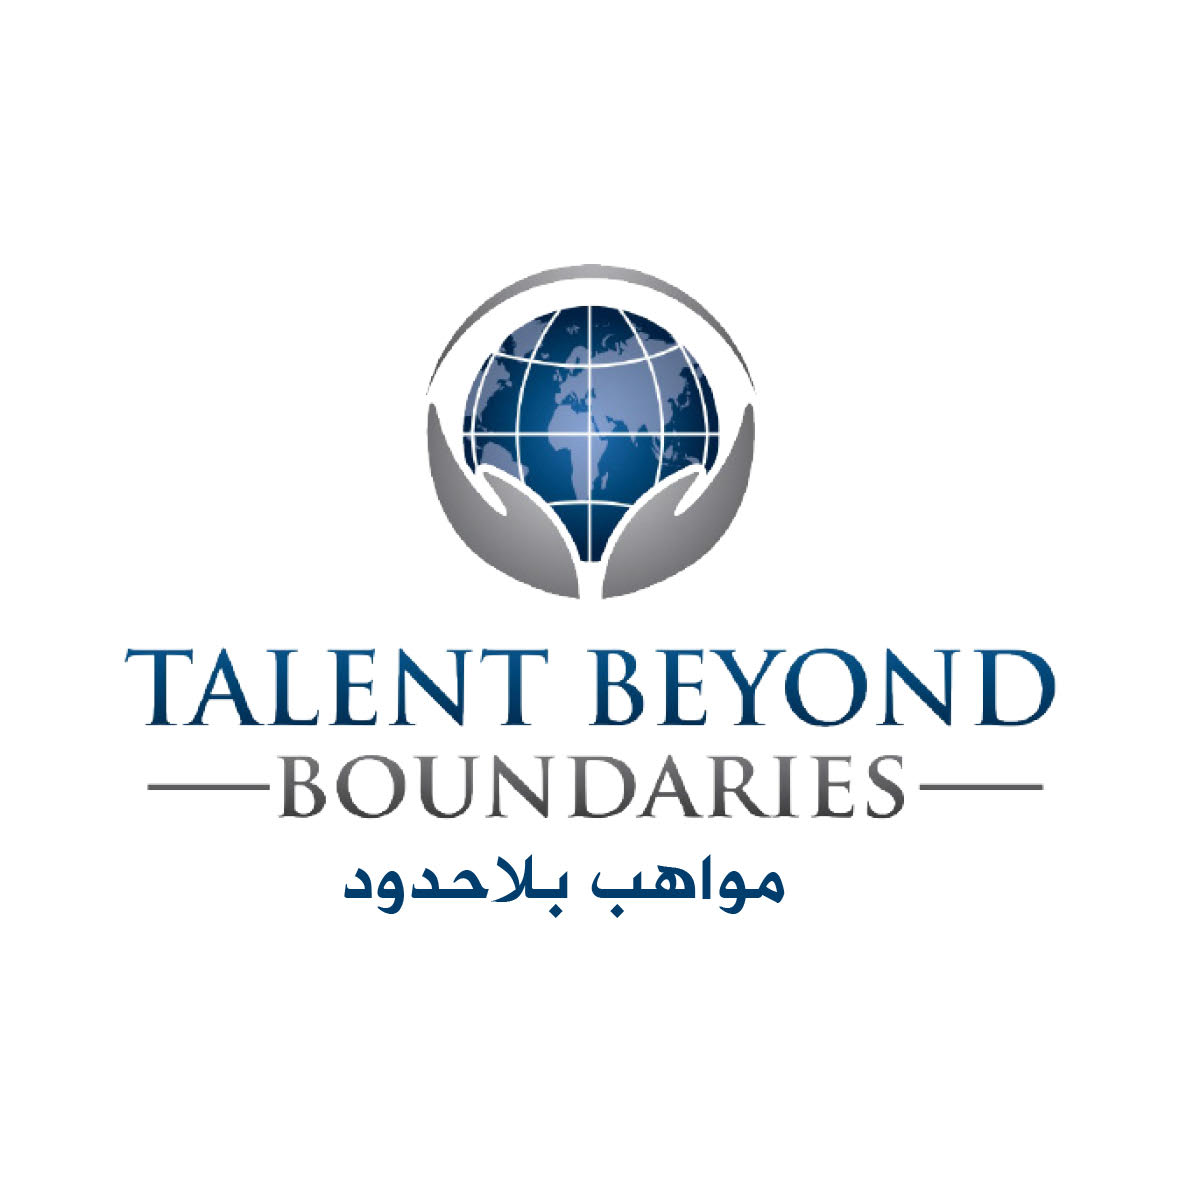 Talent Beyond Boundaries.jpg